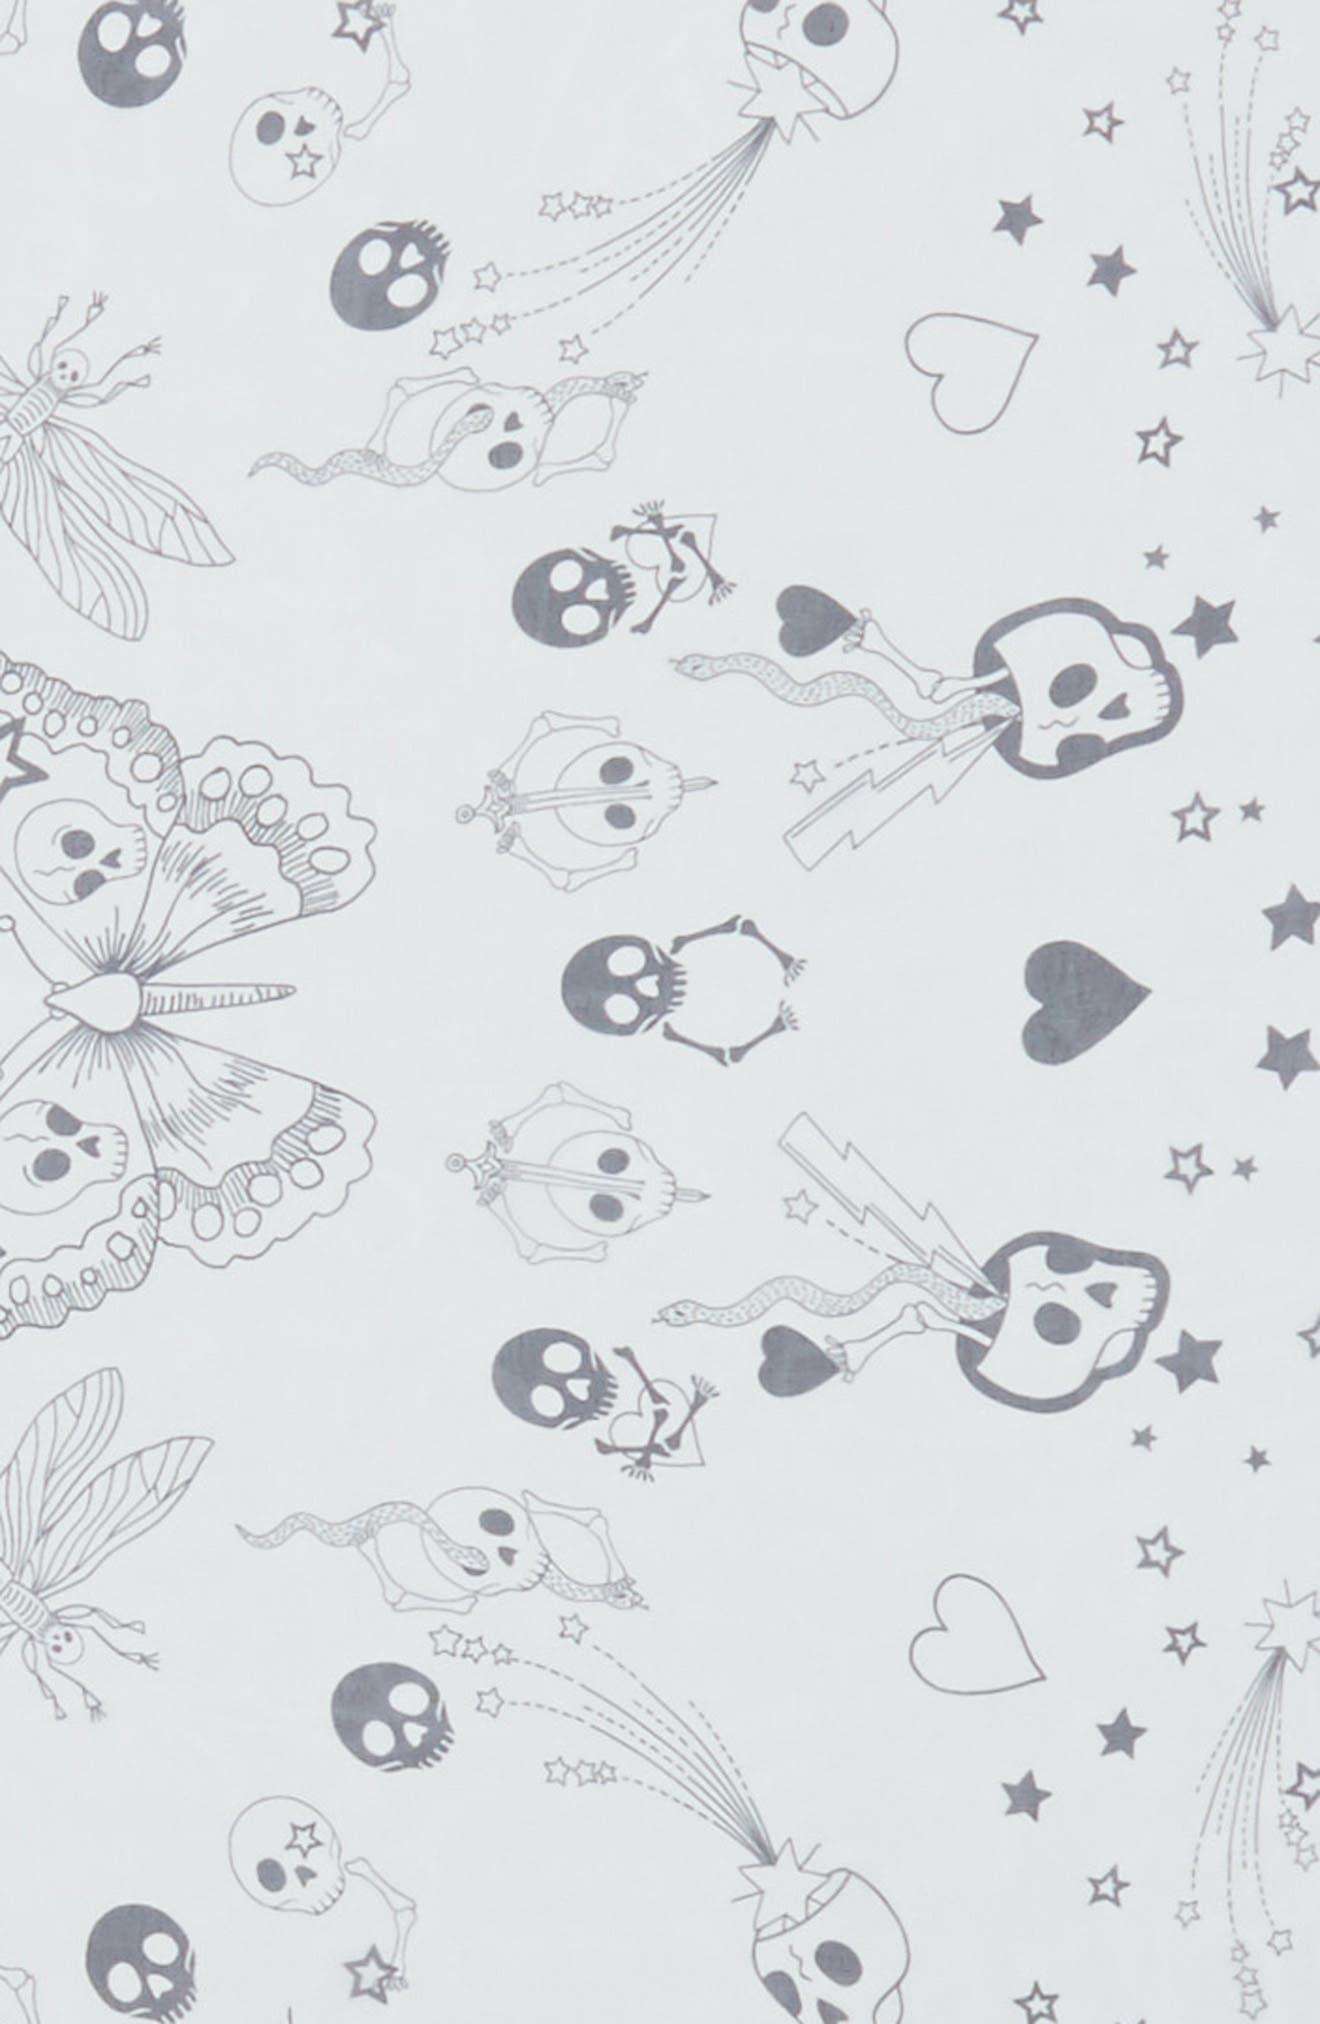 Party Skull Silk Scarf,                             Alternate thumbnail 4, color,                             White/ Black